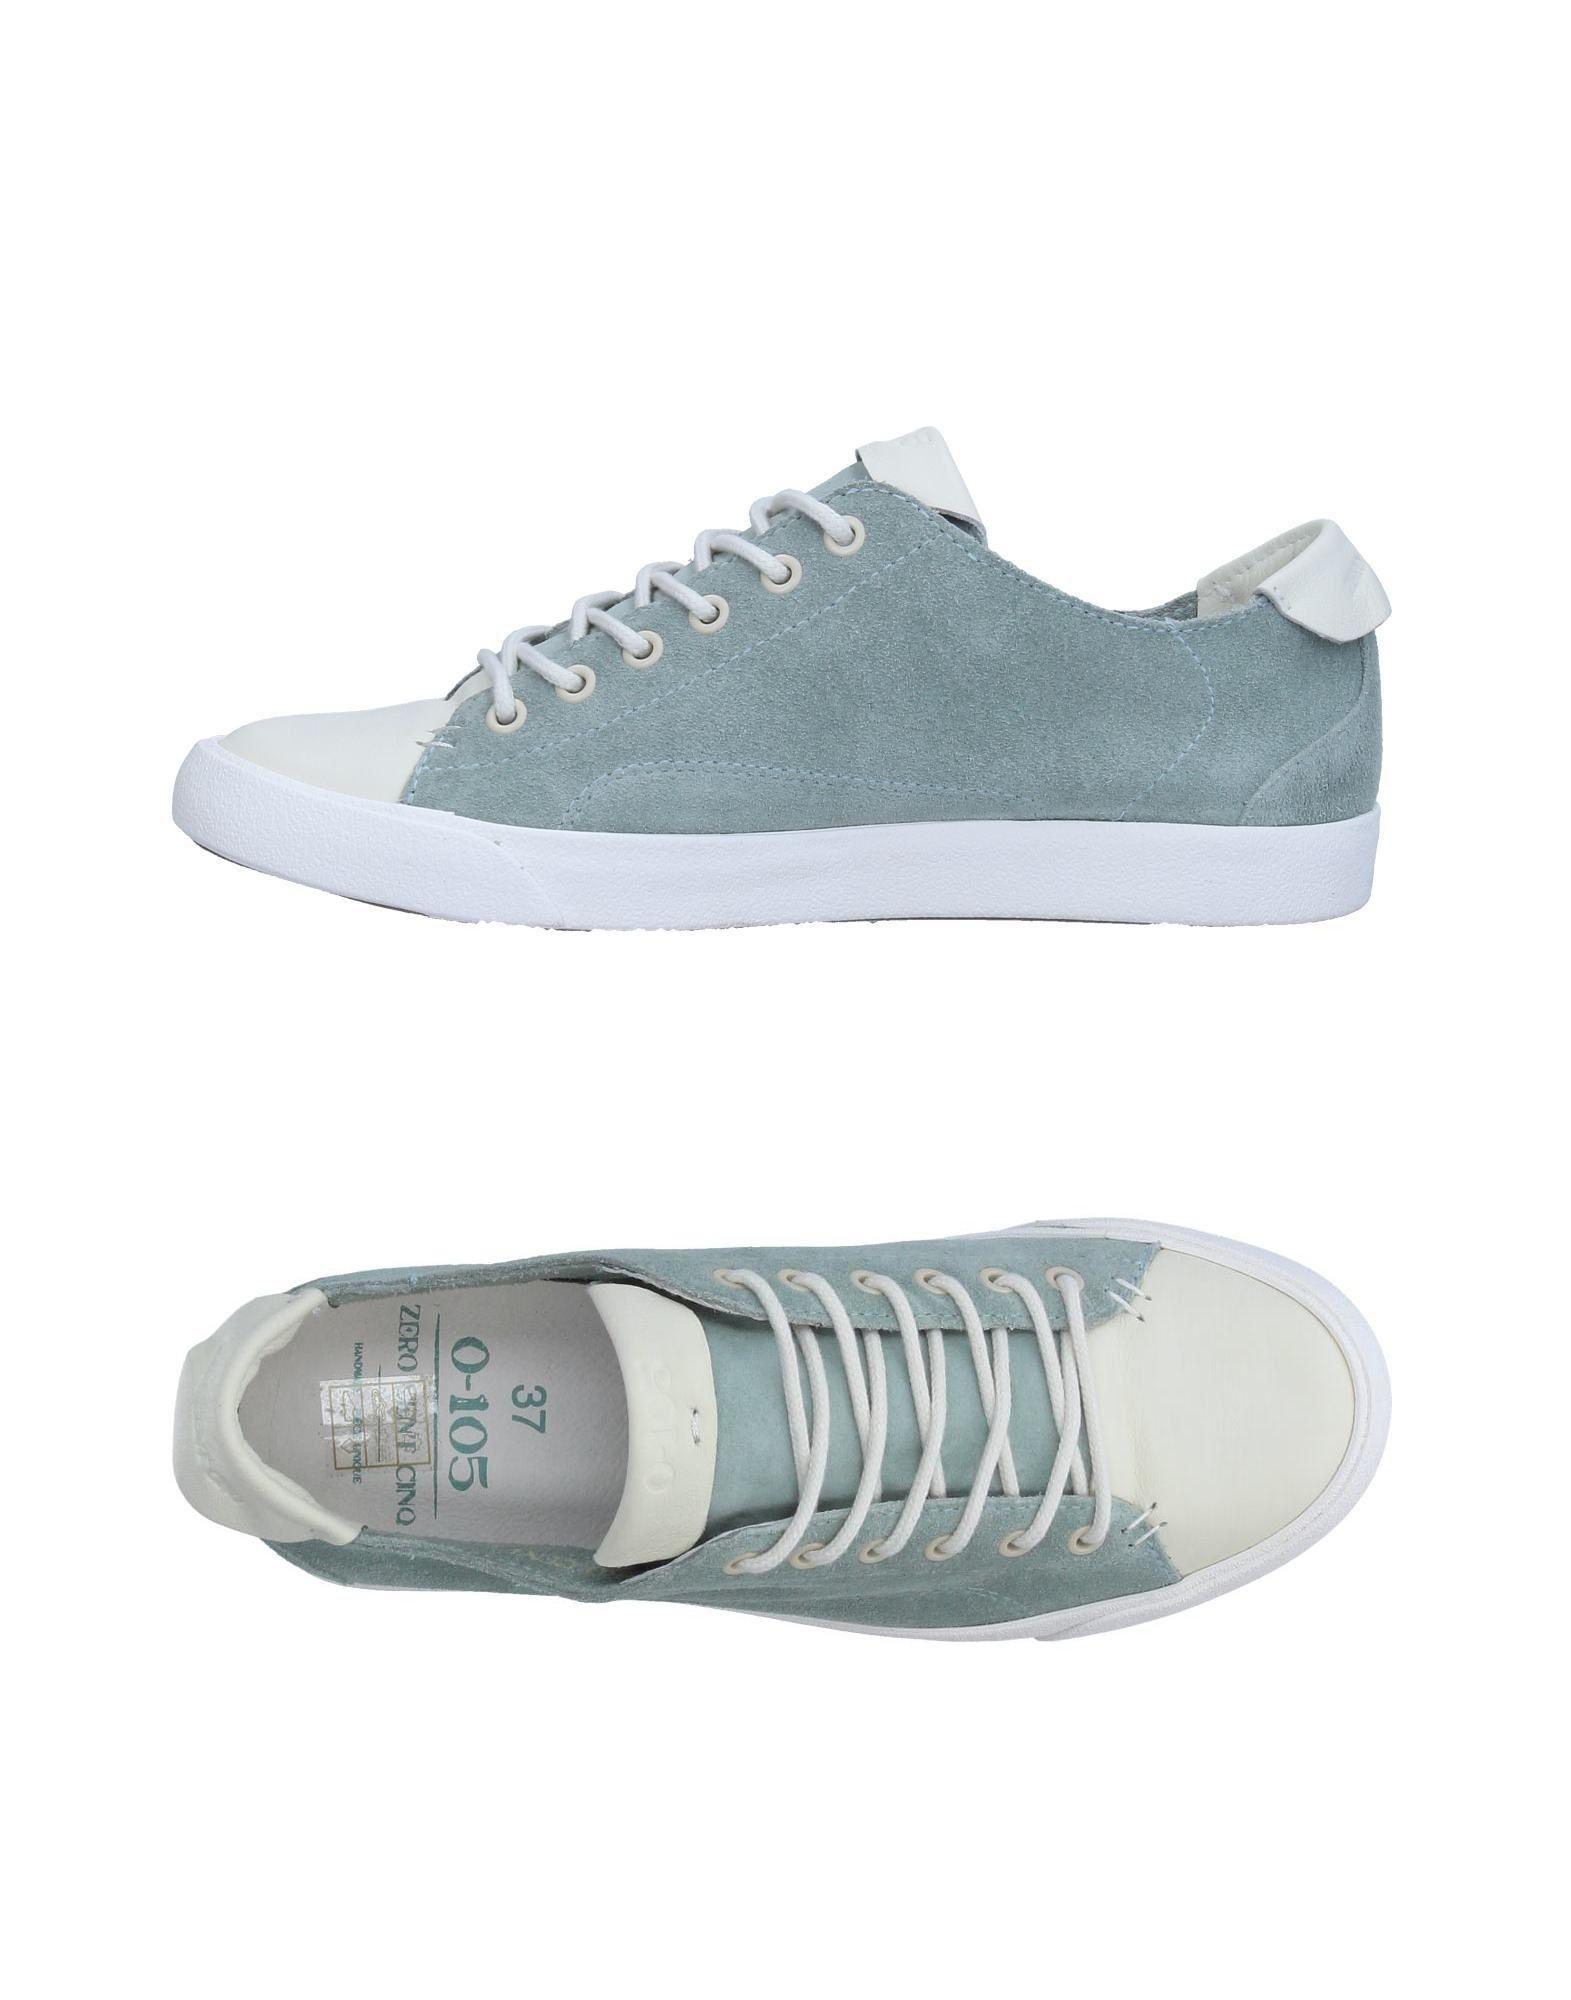 0 105 ZERO CENT CINQ Sneakers